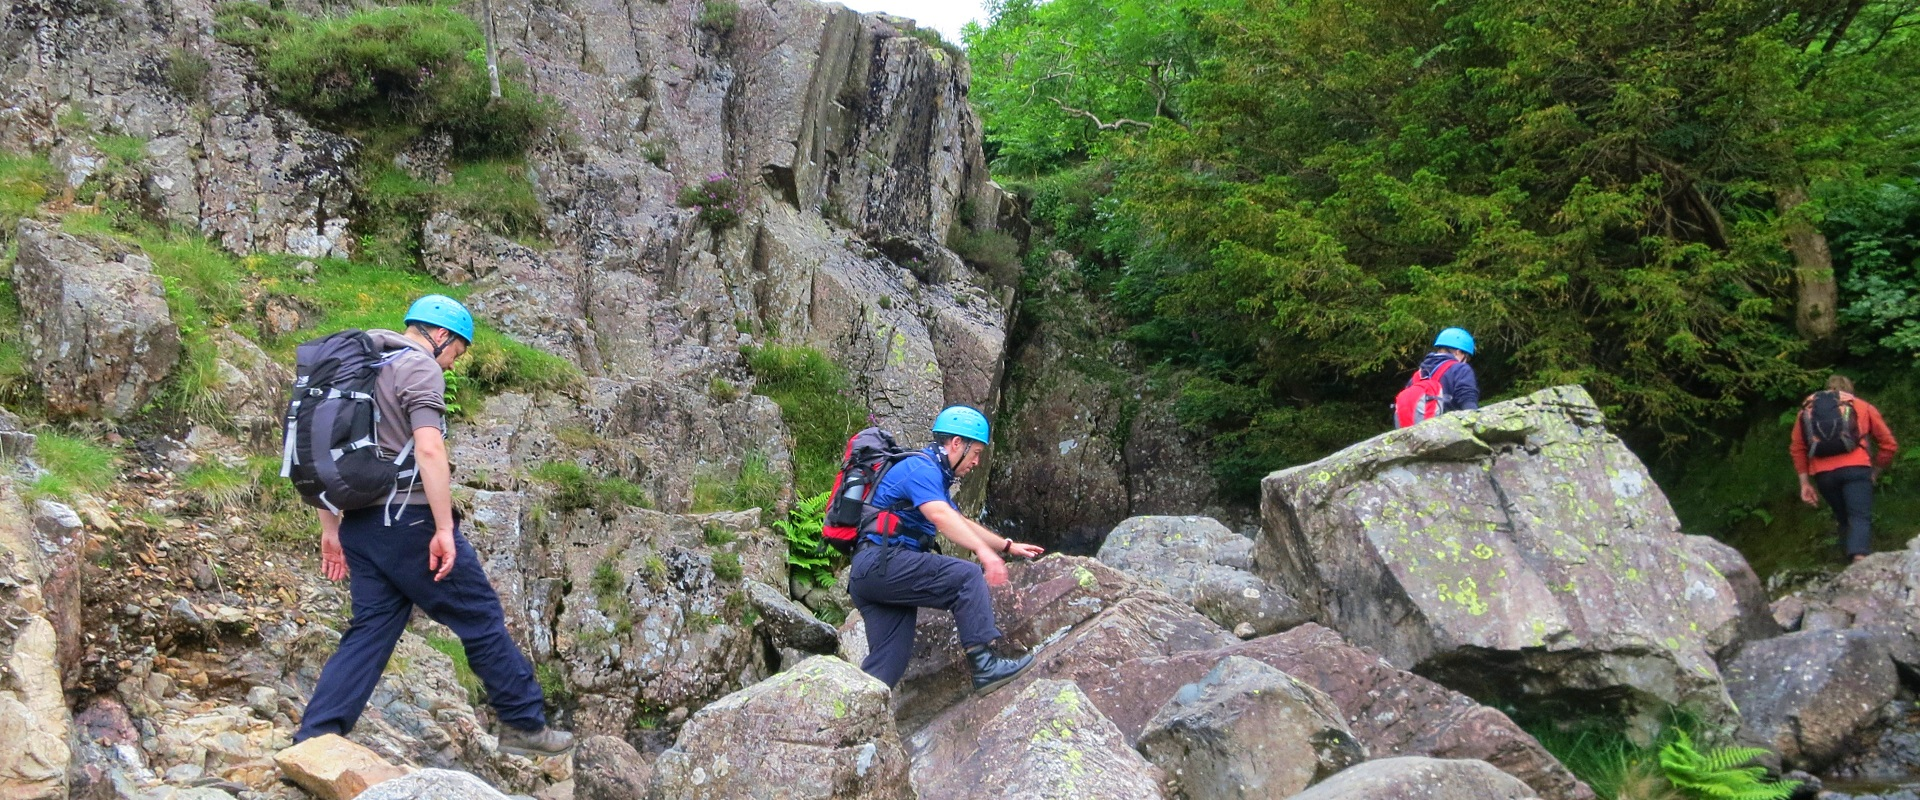 Scrambling & Hiking Weekend